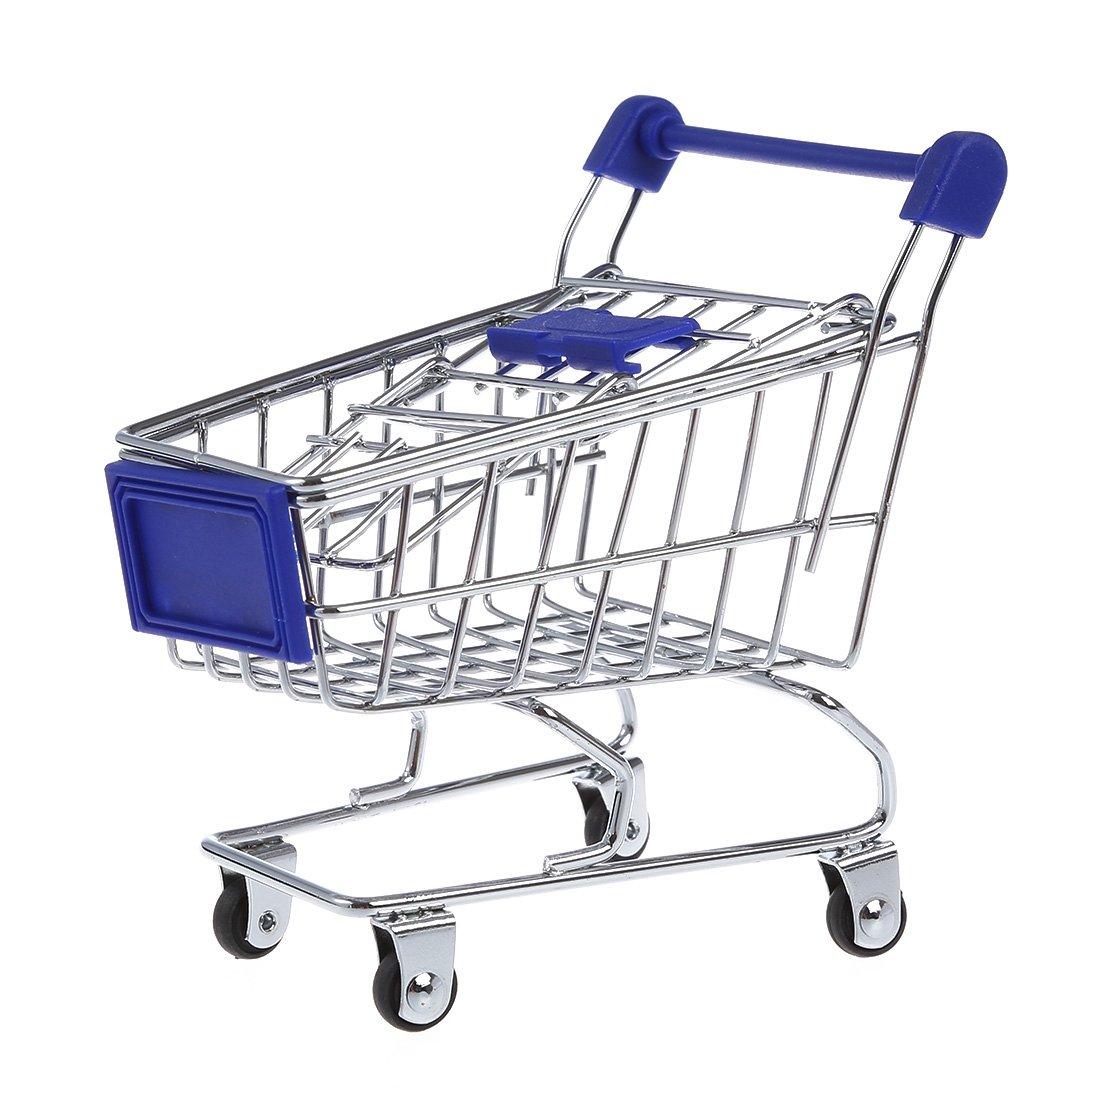 SODIAL azul Carrito de compra R carrito de compra lapicera hamster de juguete de supermercado para ninos